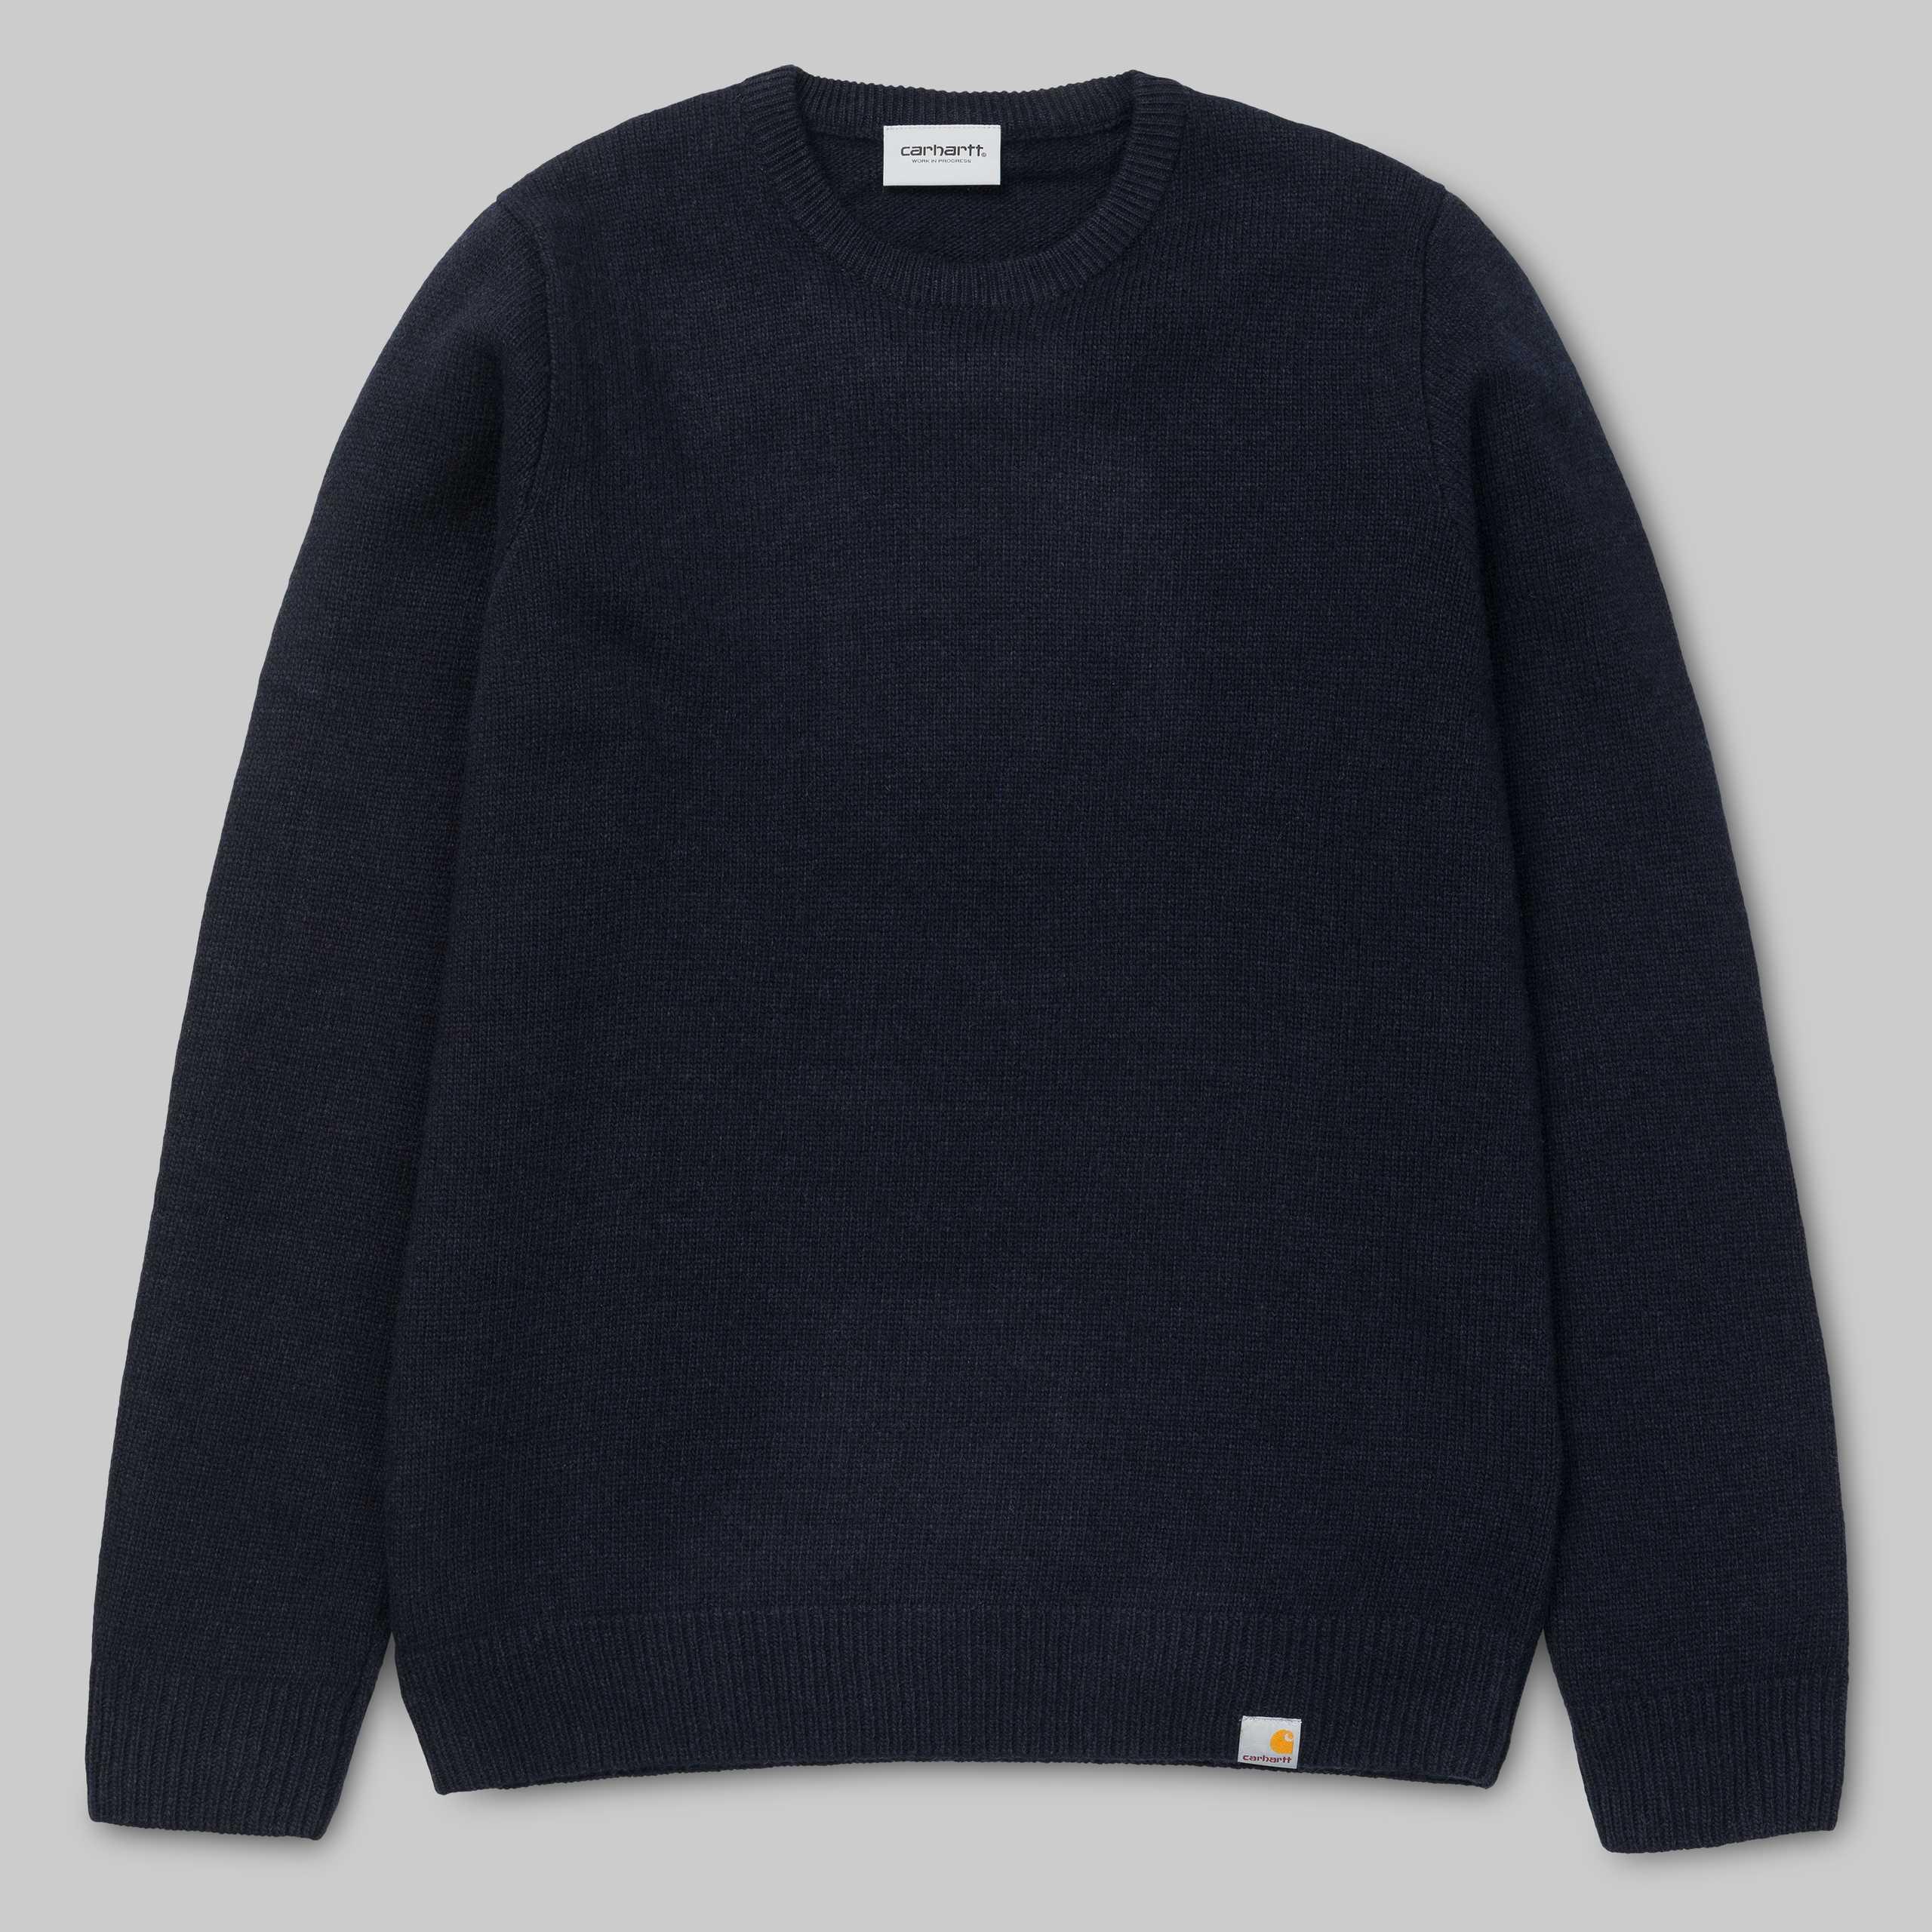 Carhartt Allen Sweater S